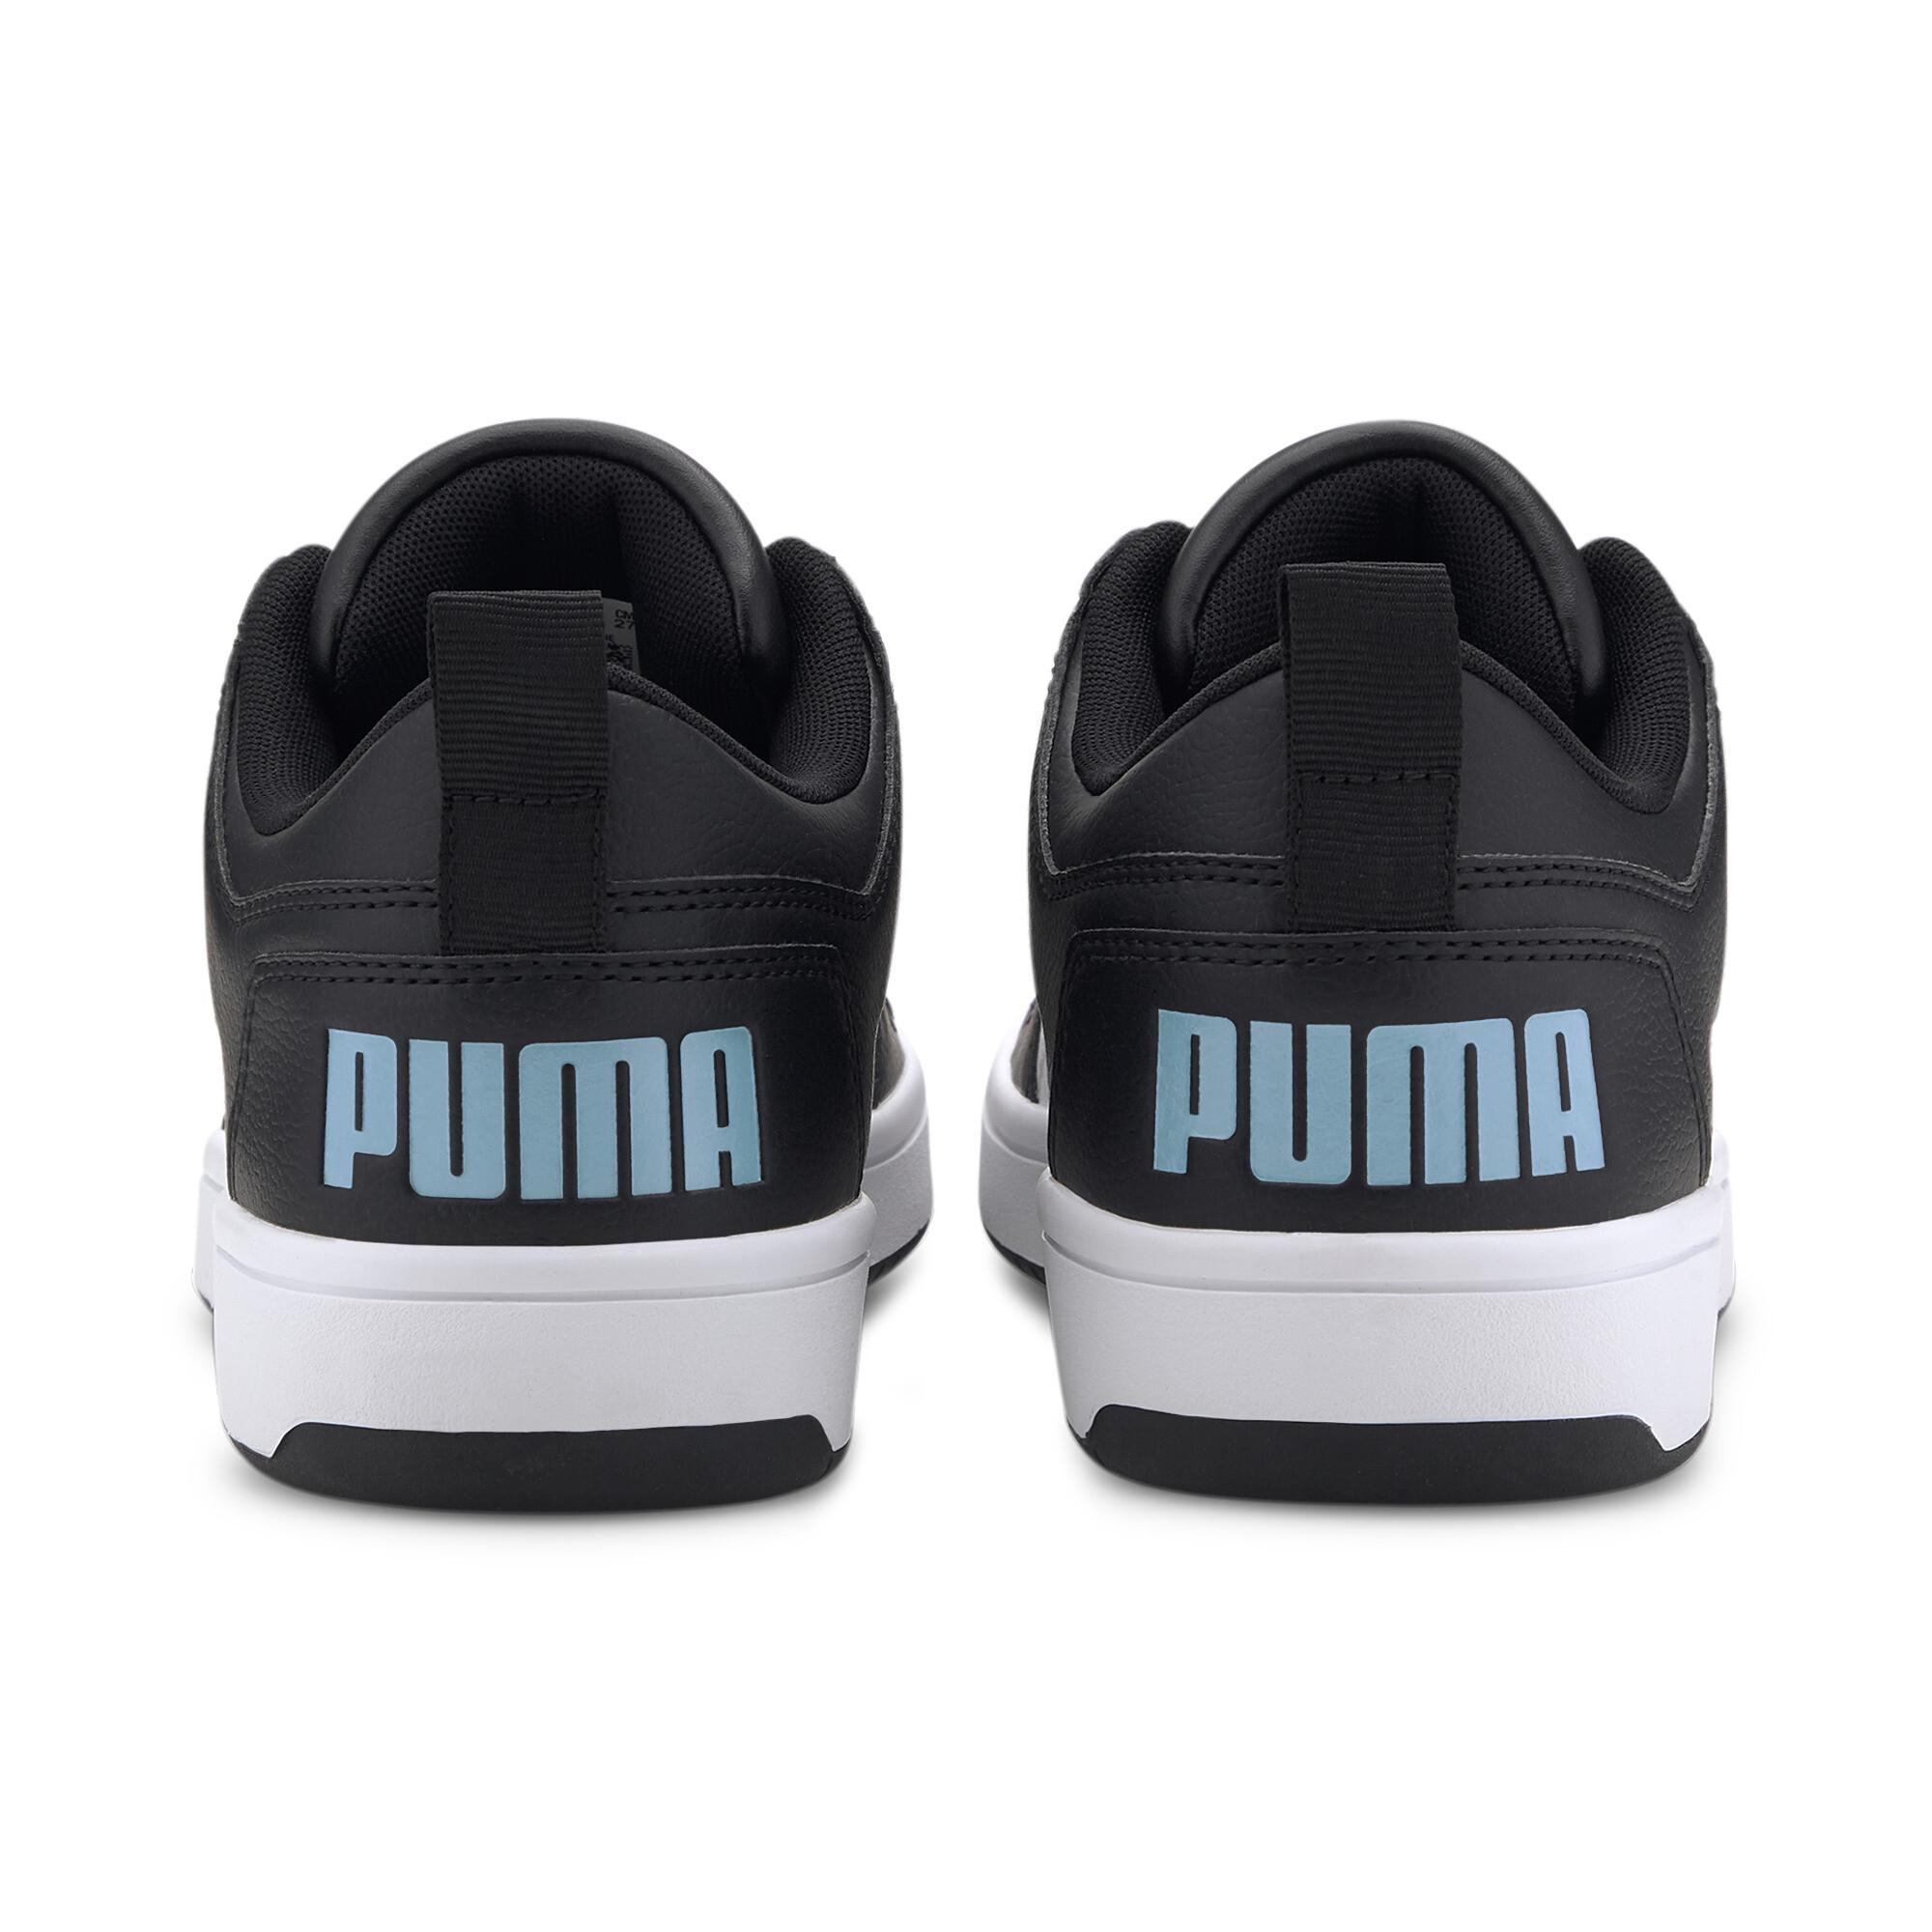 PUMA-PUMA-Rebound-LayUp-Lo-Men-039-s-Sneakers-Men-Shoe-Basics miniatura 22